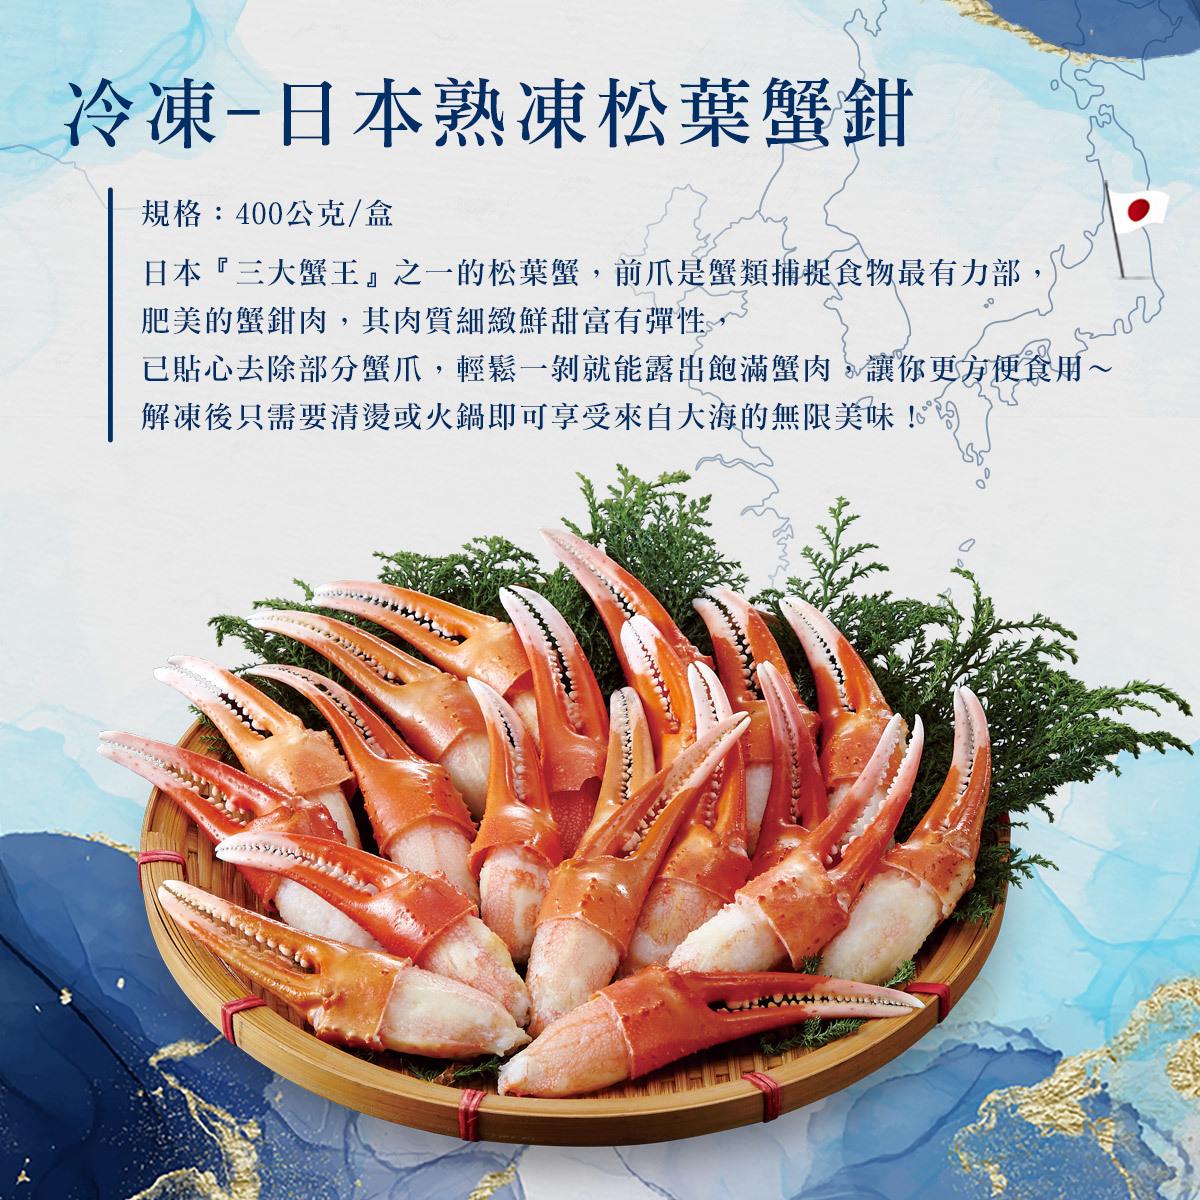 解凍 冷凍 蟹